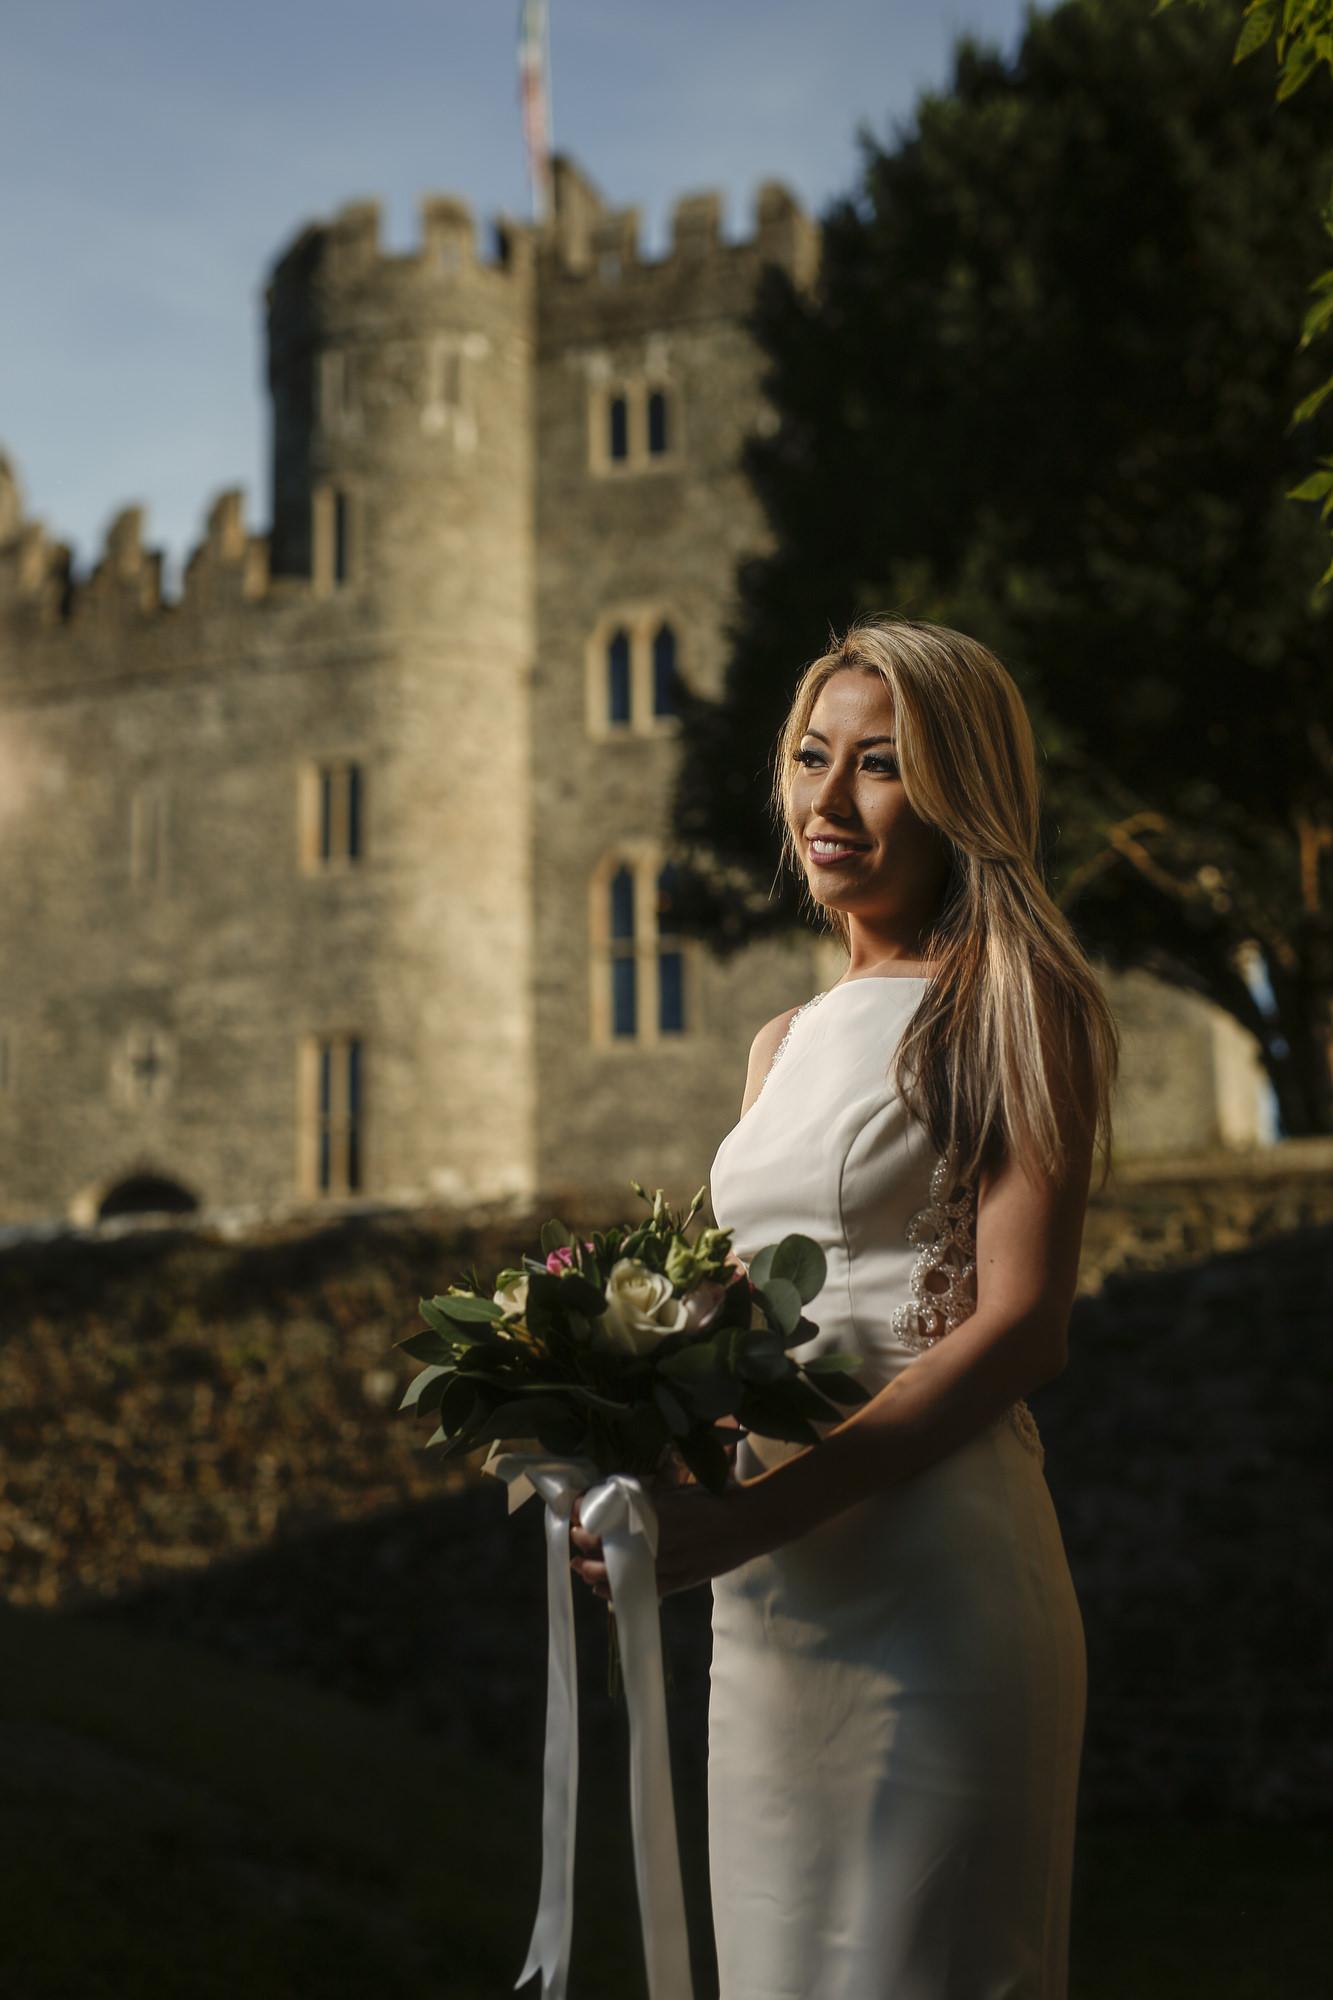 kilkea_castle_wedding_photographer_goldenmoments_042.jpg